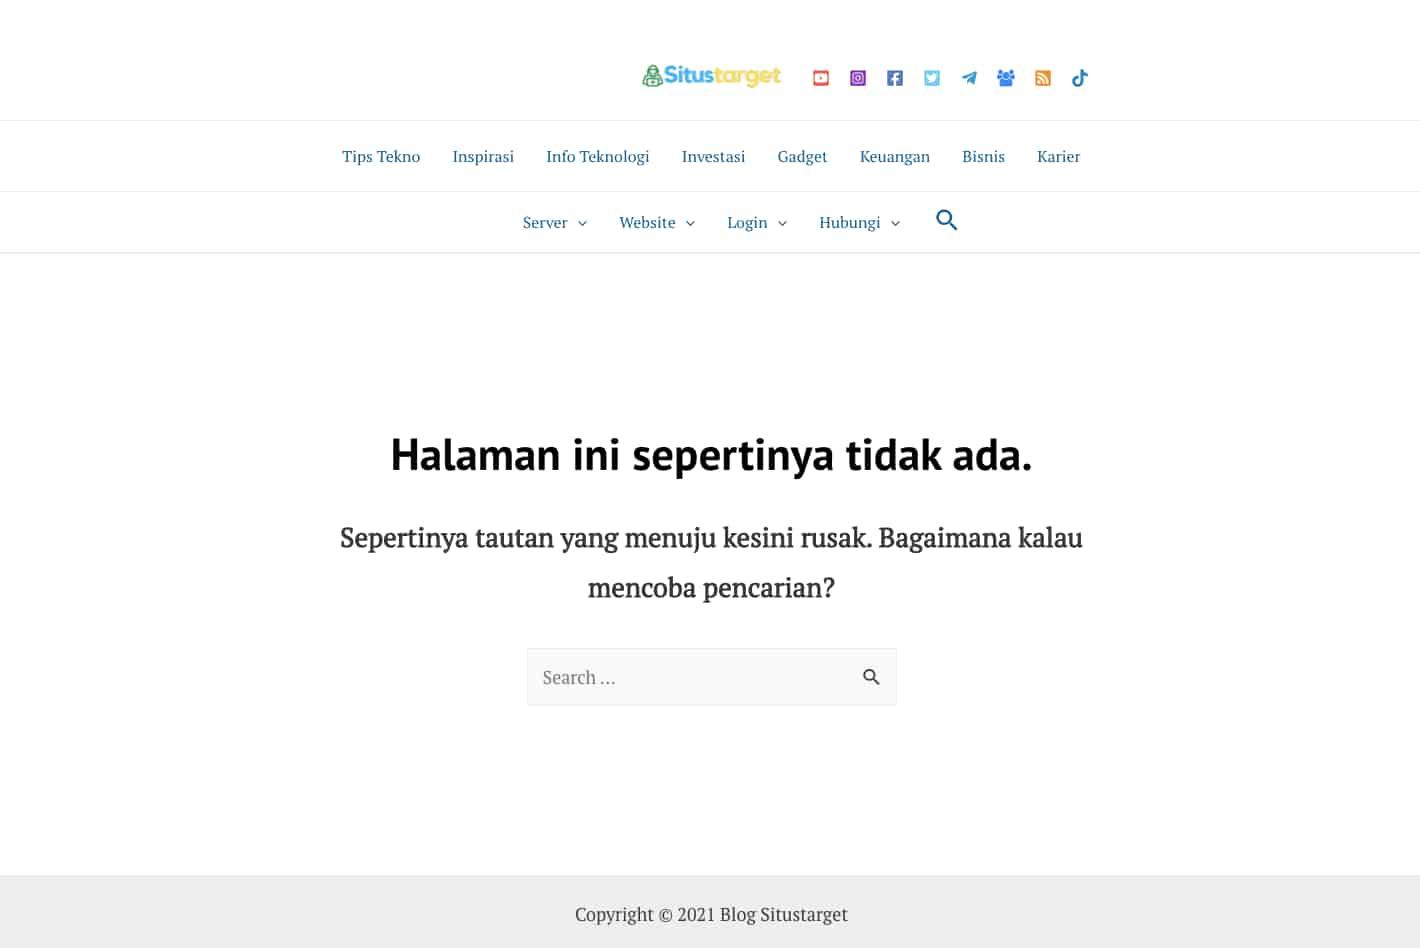 Contoh halaman eror 404 pada situstarget.com